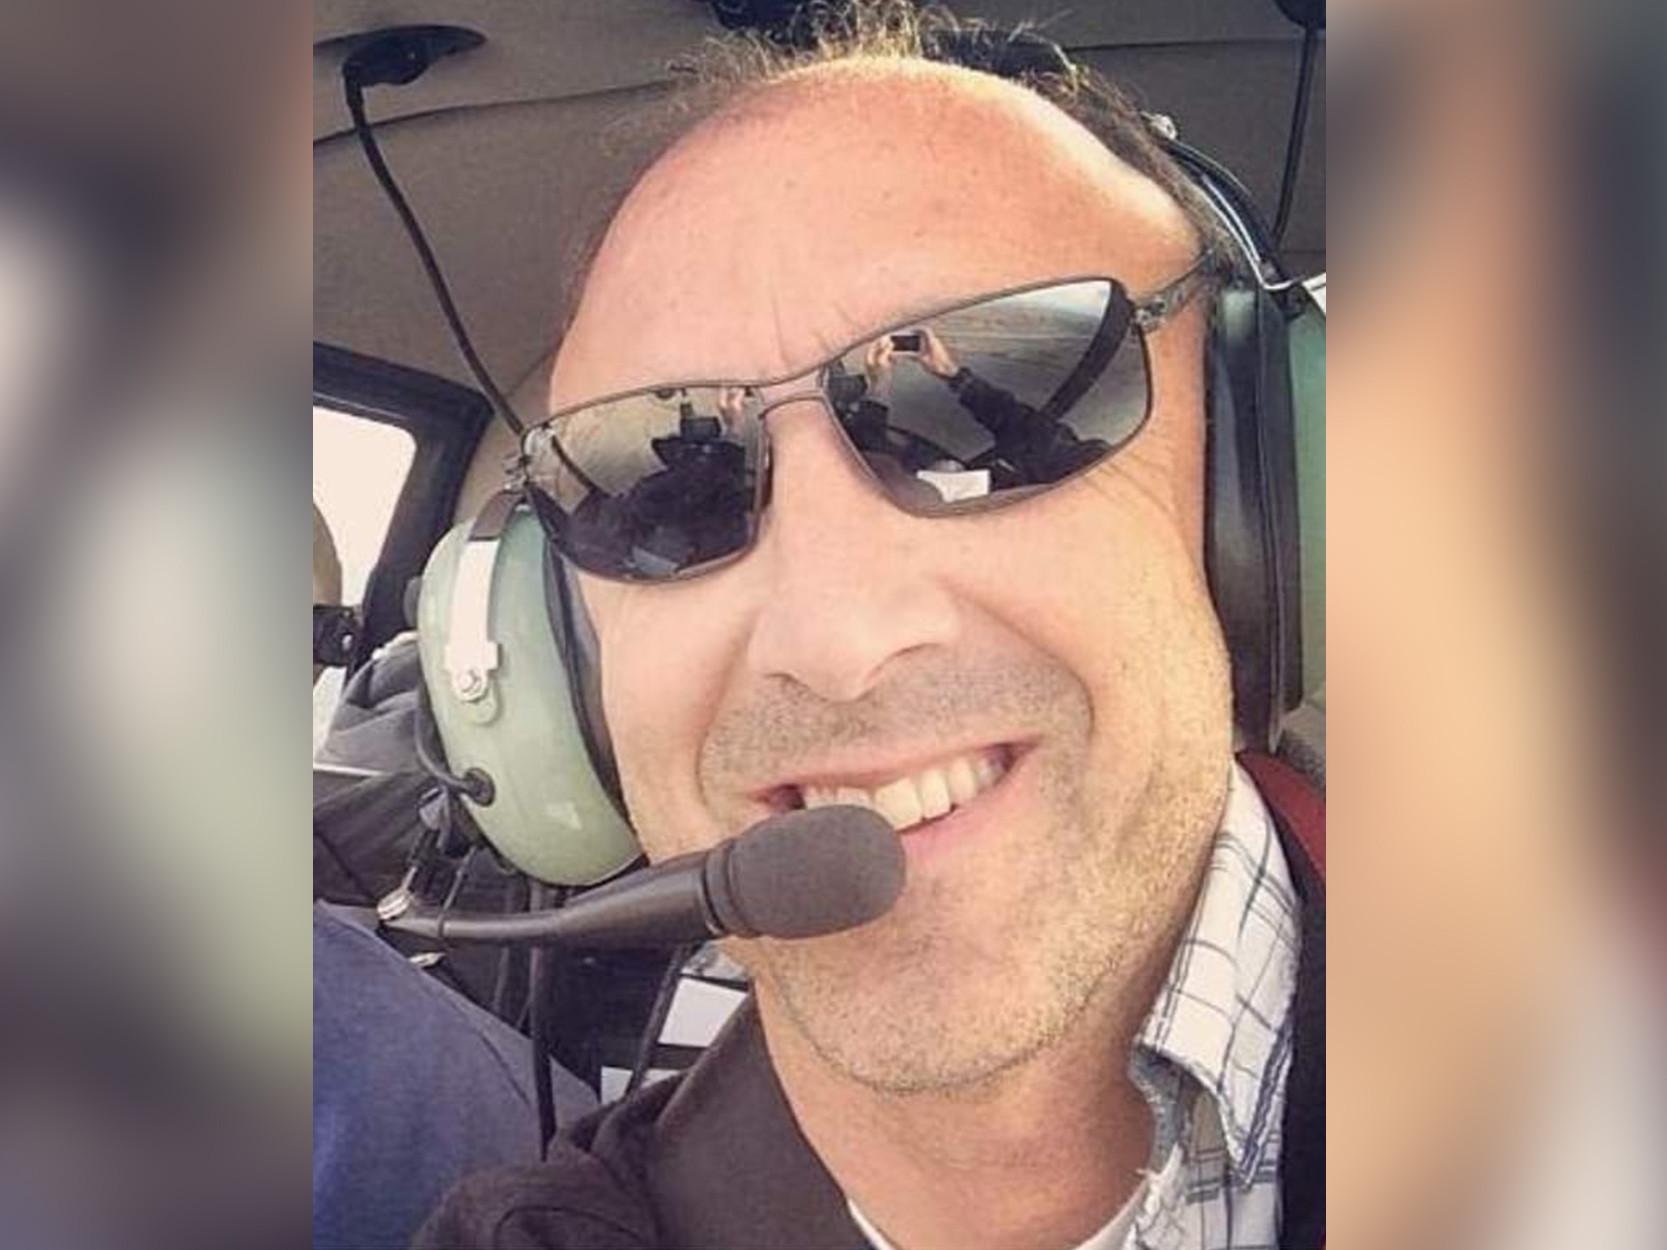 Friends identify 'incredible' pilot in chopper crash that killed Kobe Bryant